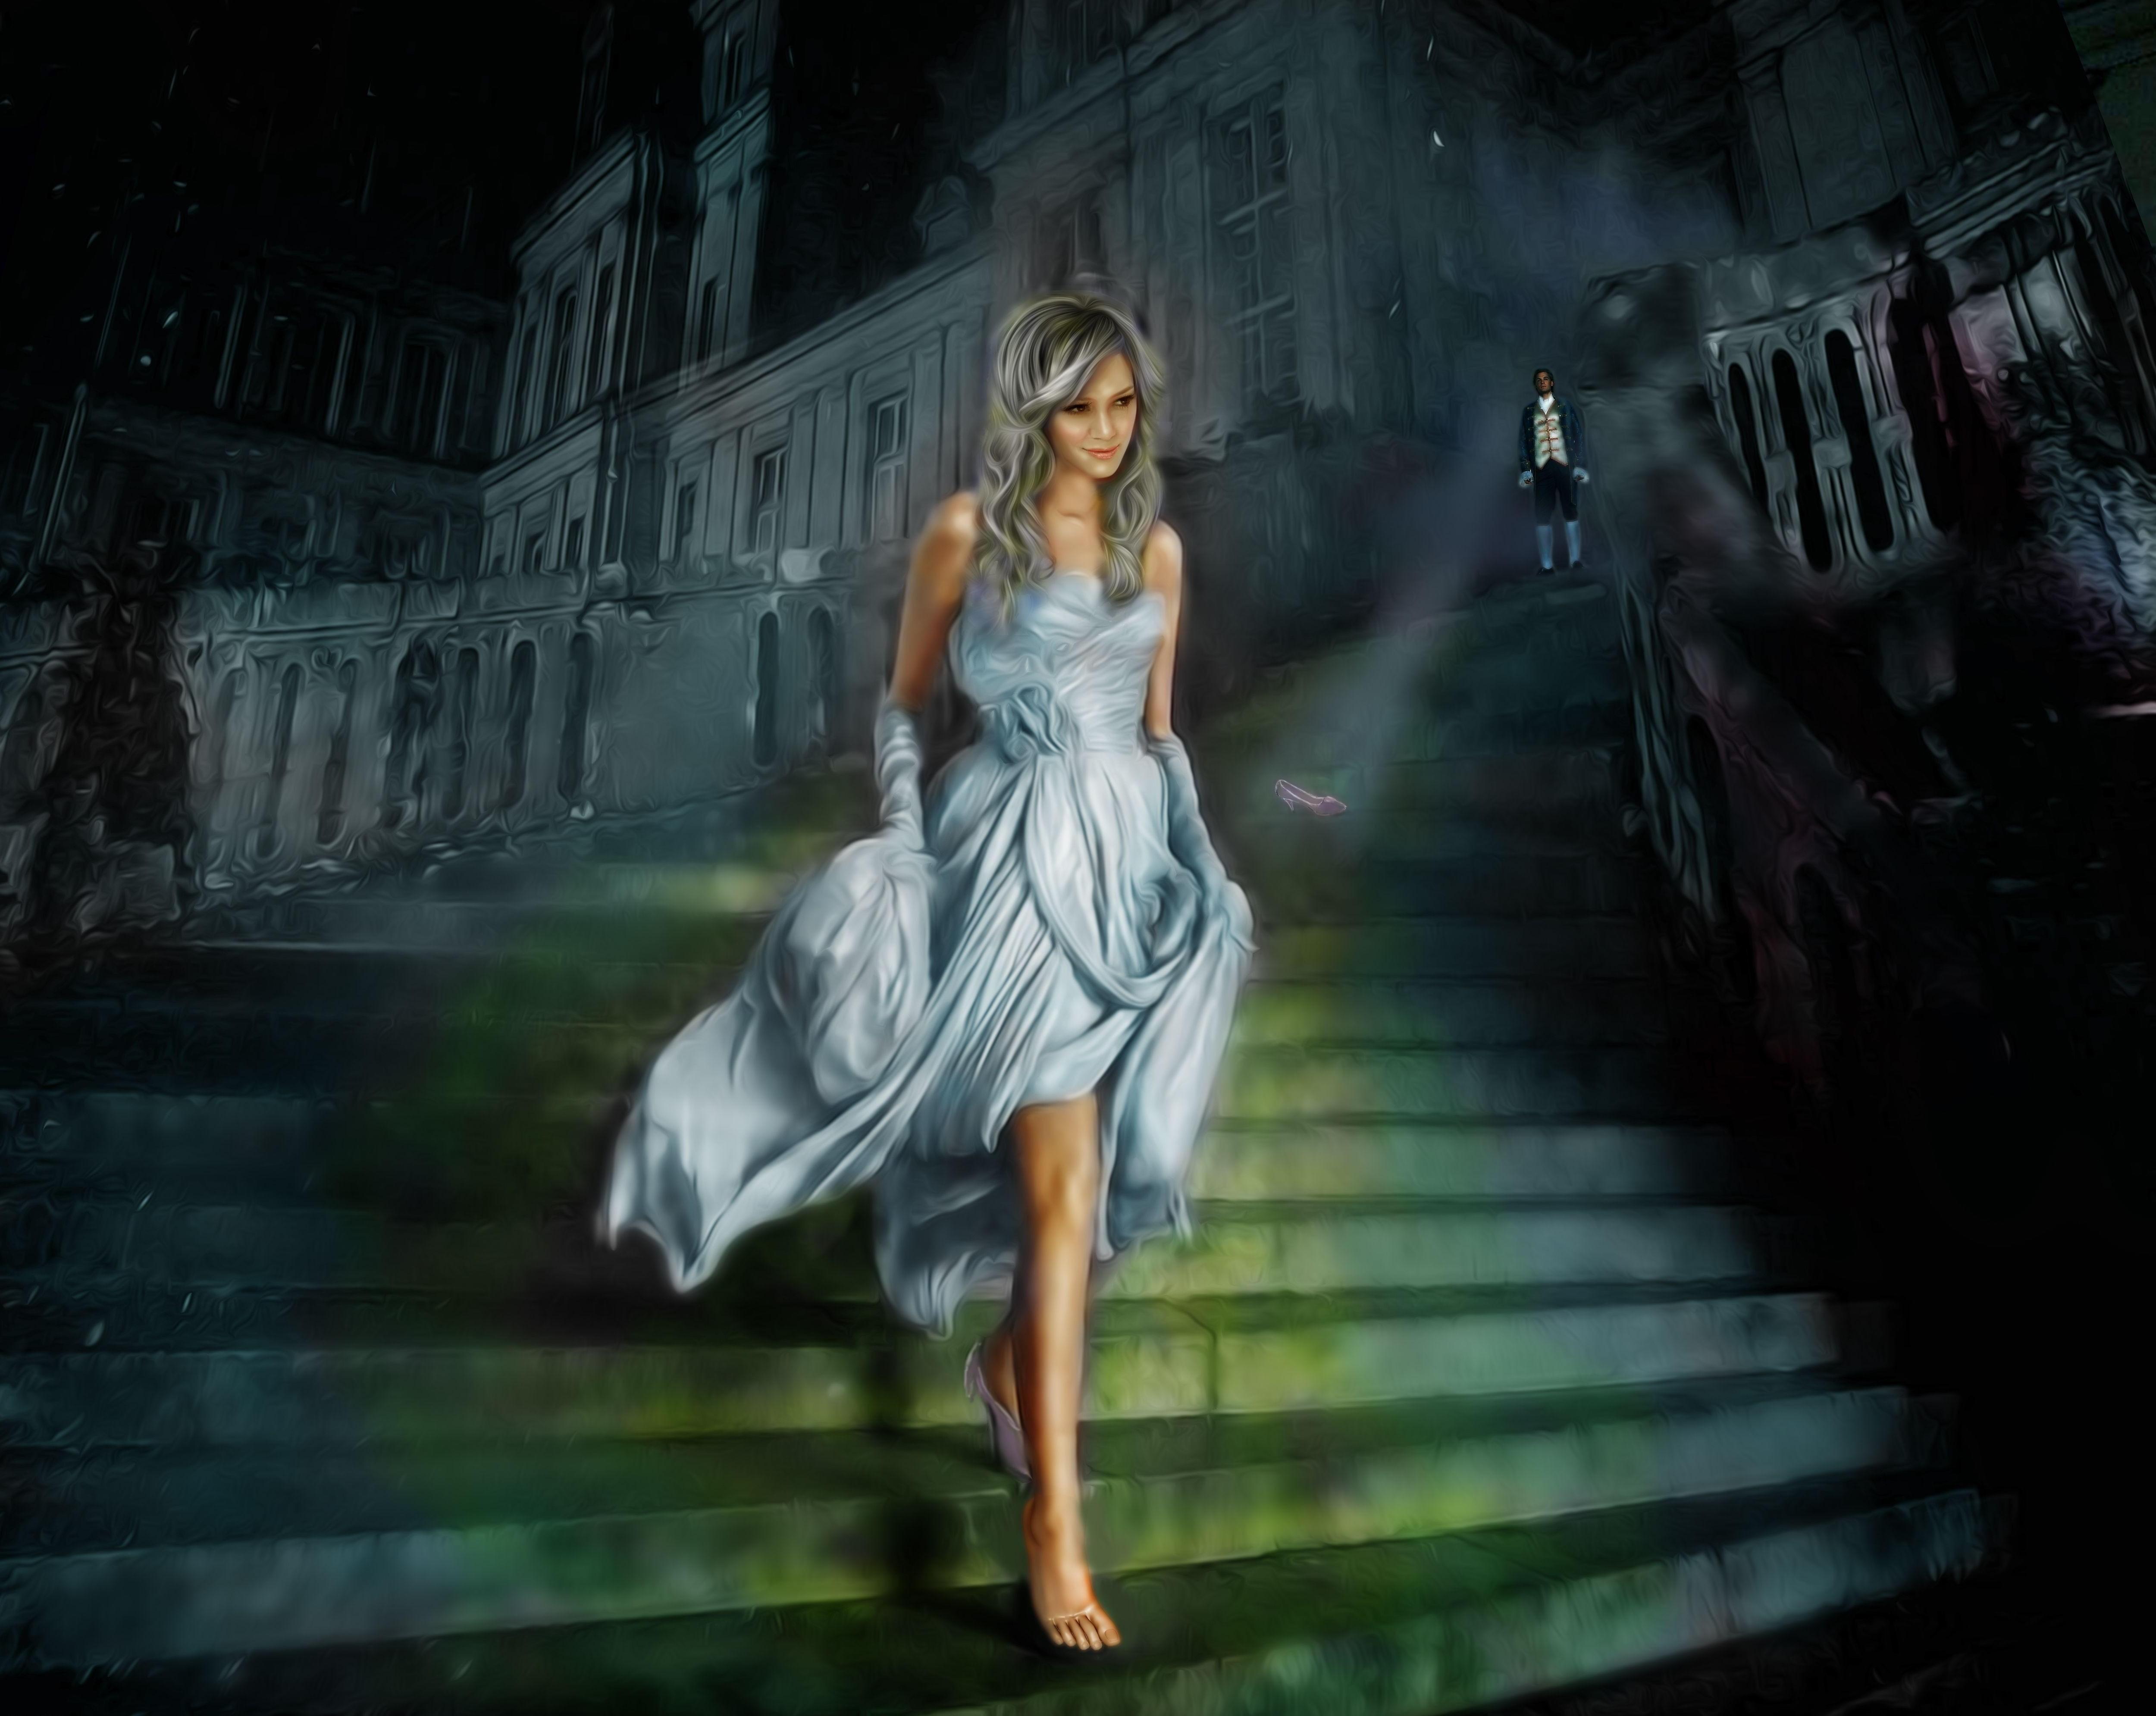 Wallpaper 5000x3980 px castle cinderella dark digital art 5000x3980 px castle cinderella dark digital art dress fairy tale fantasy art high heels men night voltagebd Gallery